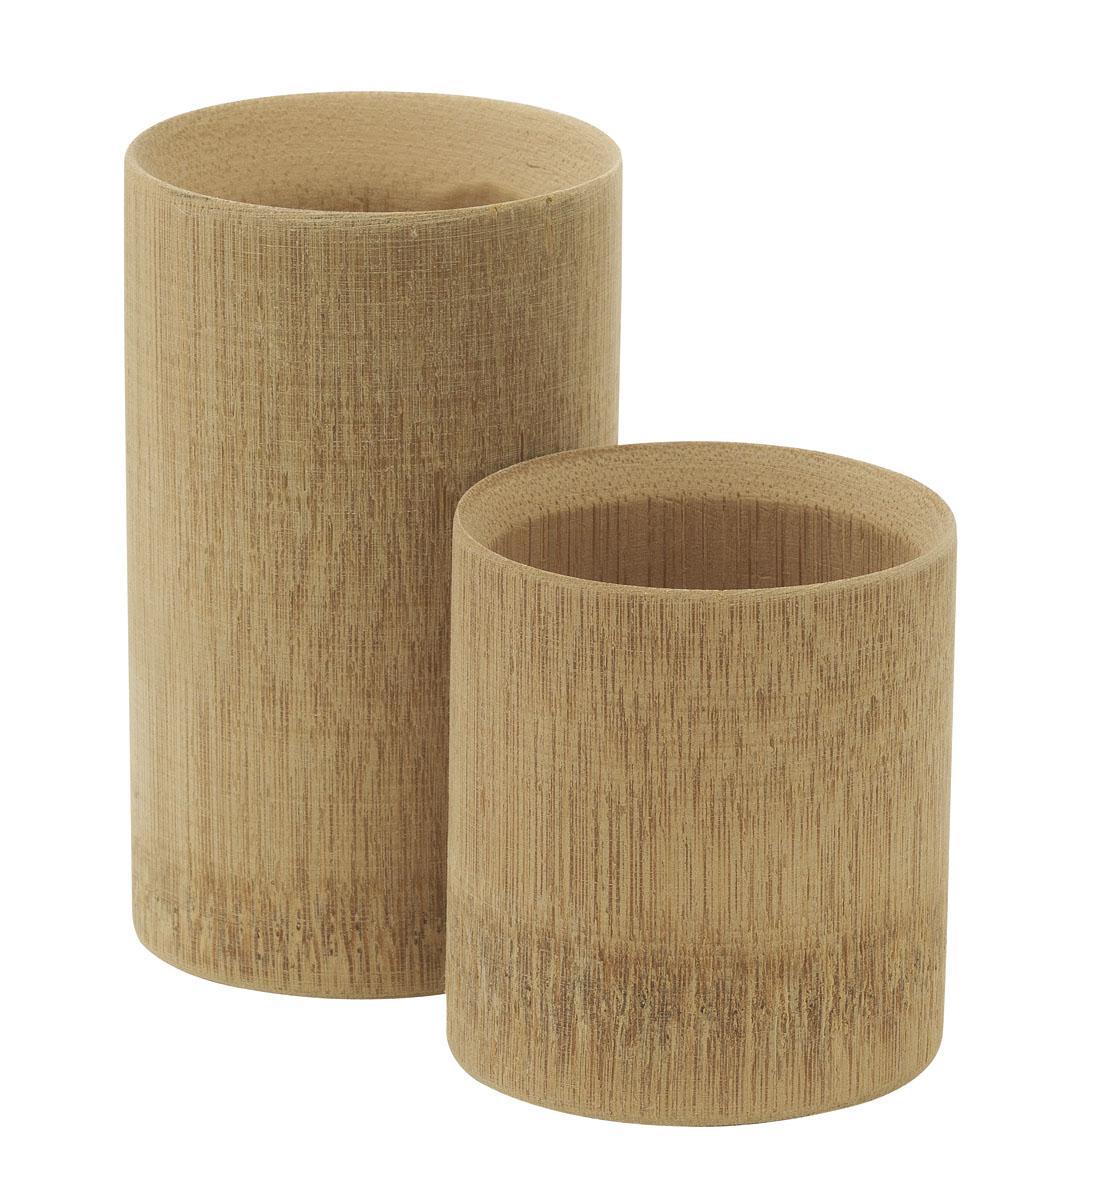 echelle bambou salle de bain echelle bambou salle de bain with echelle bambou salle de bain. Black Bedroom Furniture Sets. Home Design Ideas